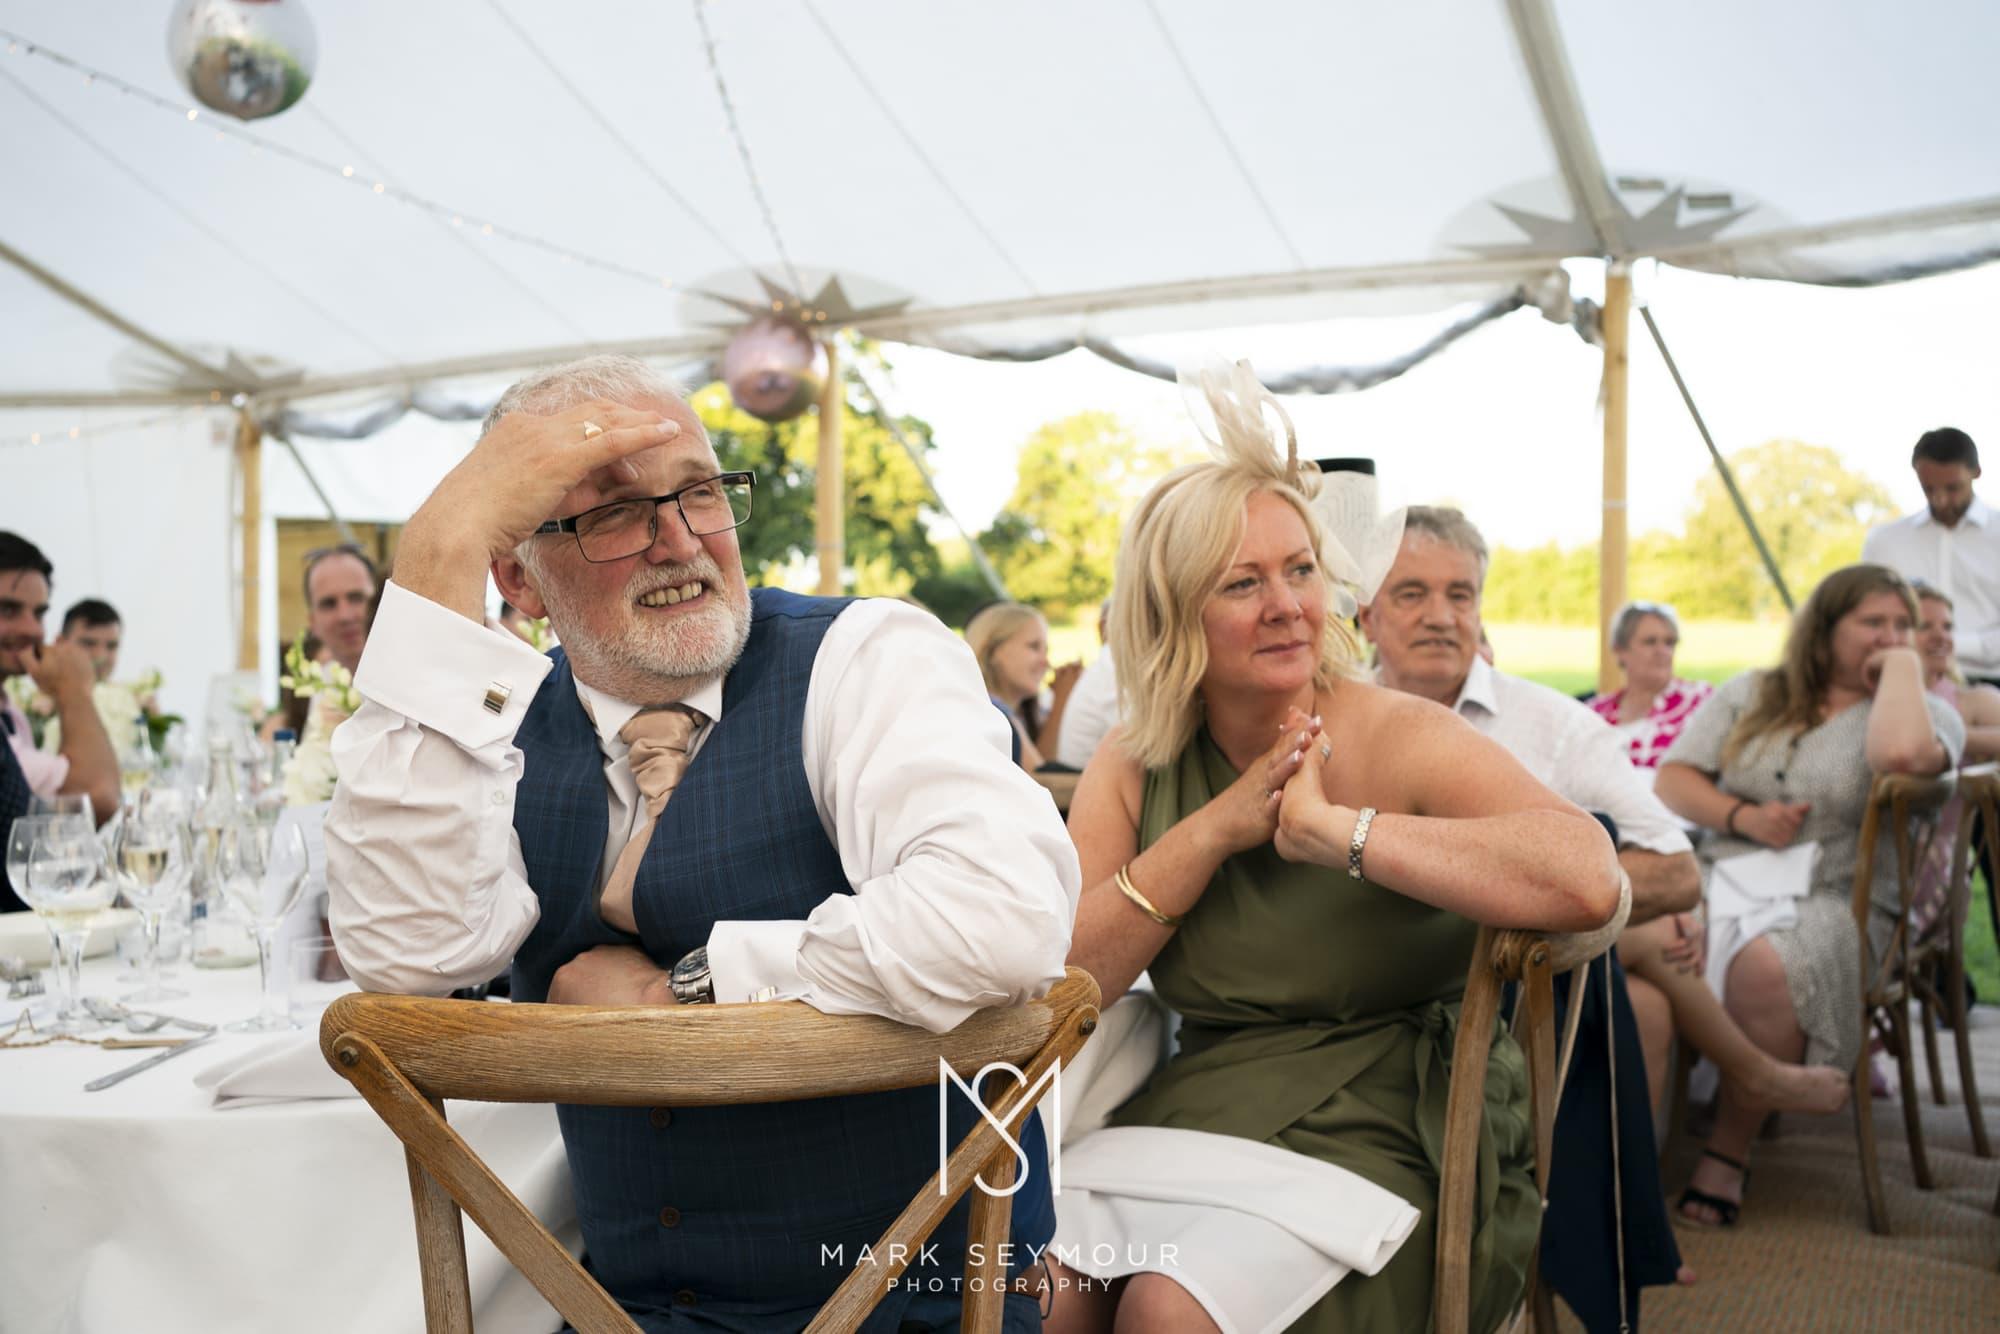 Barnsley House Wedding Photographer - Olivia and James' wedding 27